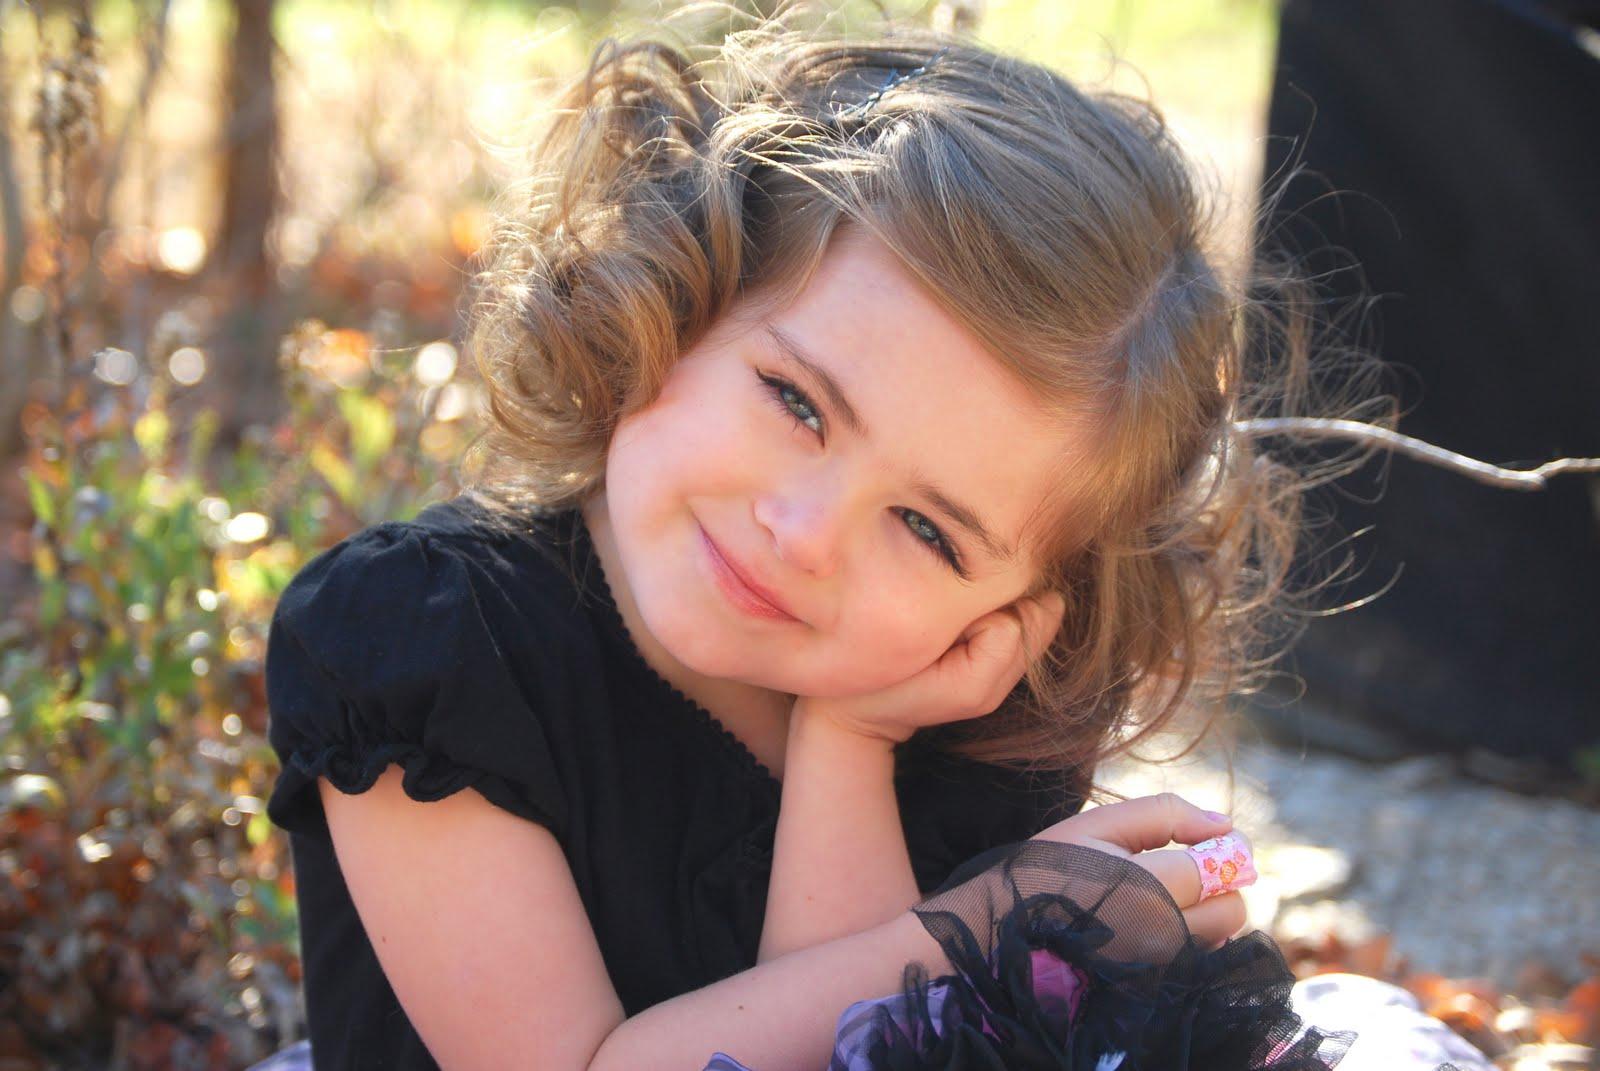 Super Cute Little Baby Wallpapers صور اطفال بنات صغيرة مواليد في خلفيات بنات بجودة Hd سوبر